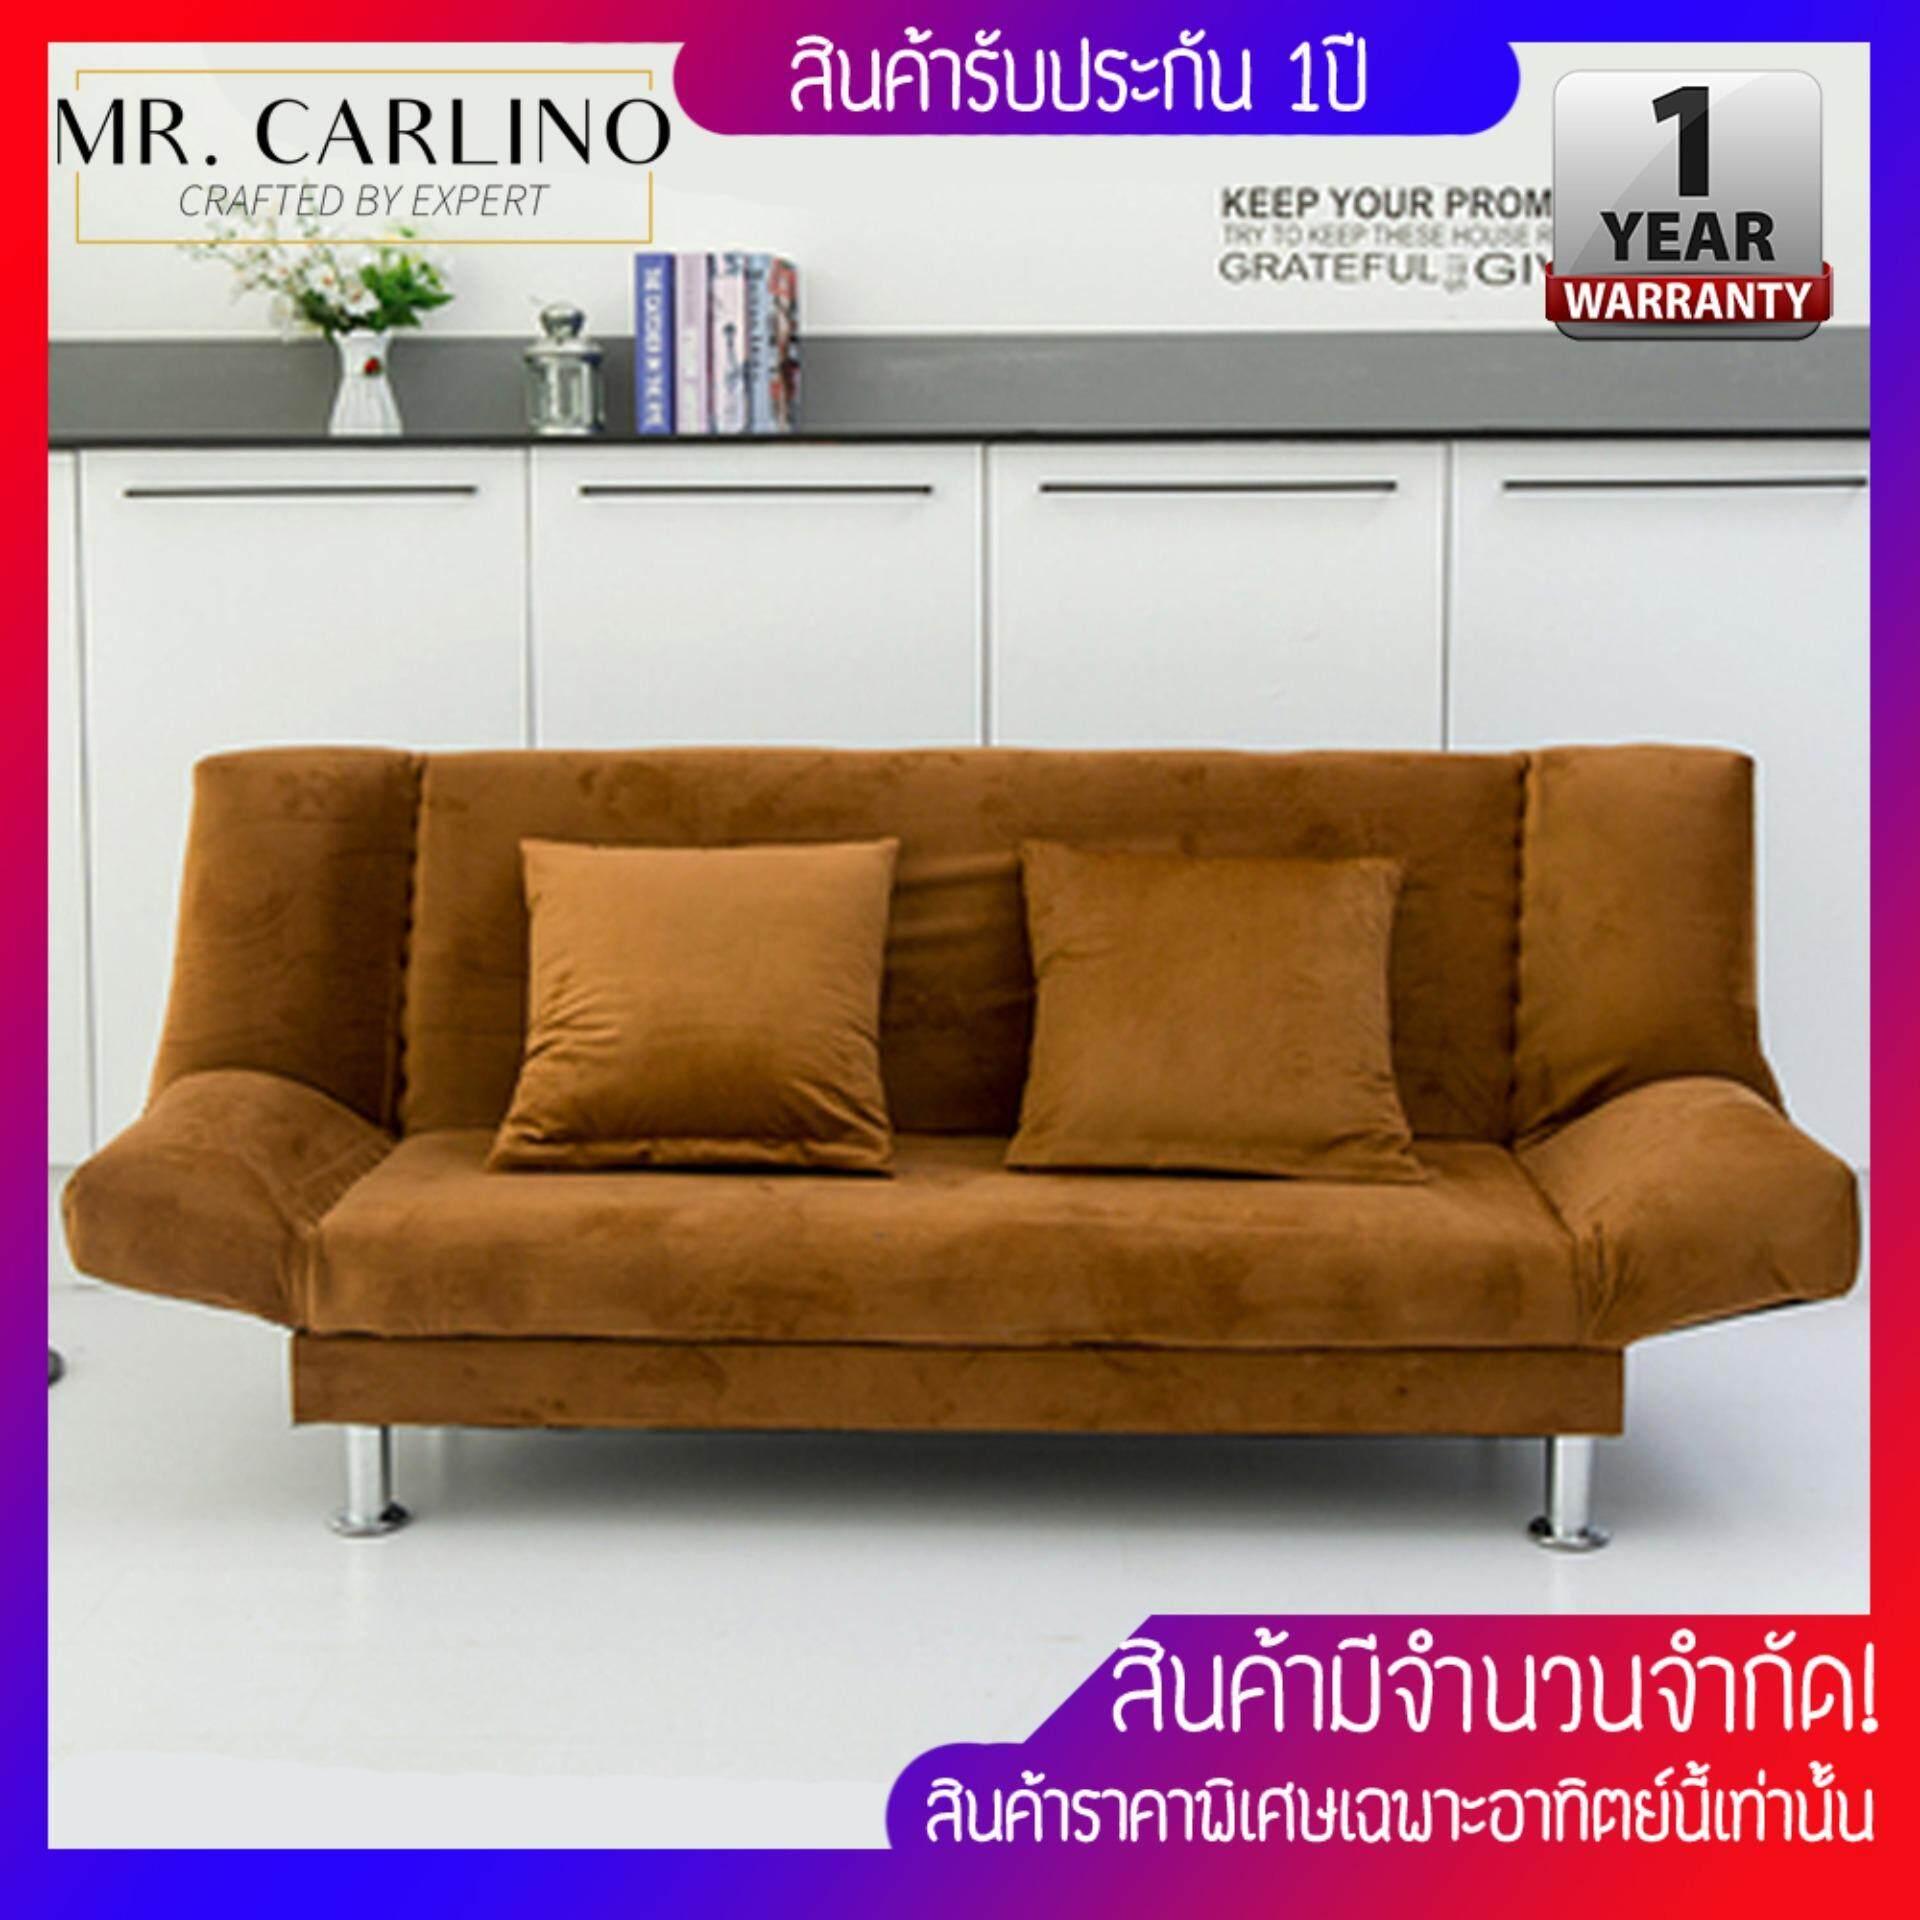 Mr. Carlino: โซฟา โซฟาปรับนอน โซฟาที่นอน คุณภาพดี (2 - In - 1 Living Room Foldable 2 Seater Sofa Bed) By Carlino Design.